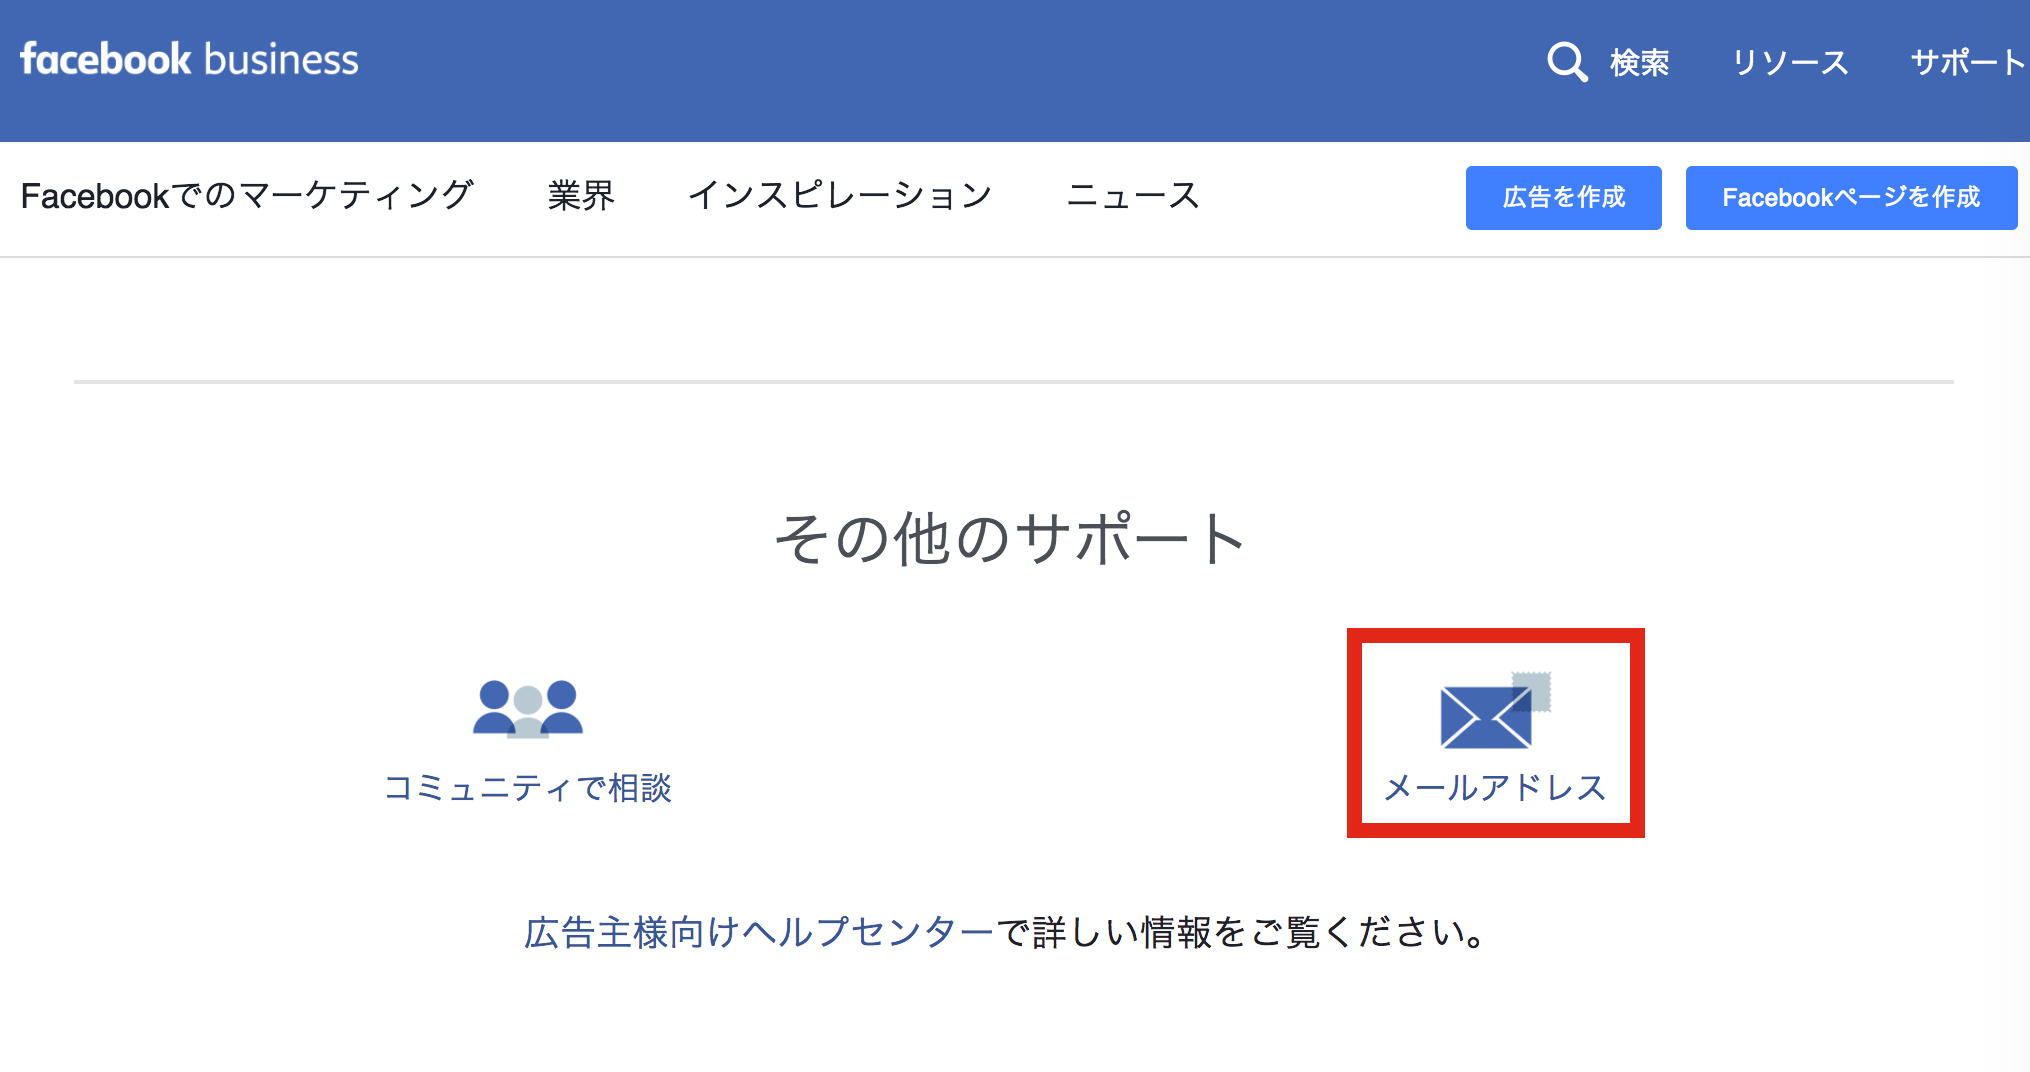 Facebook 問い合わせボタン